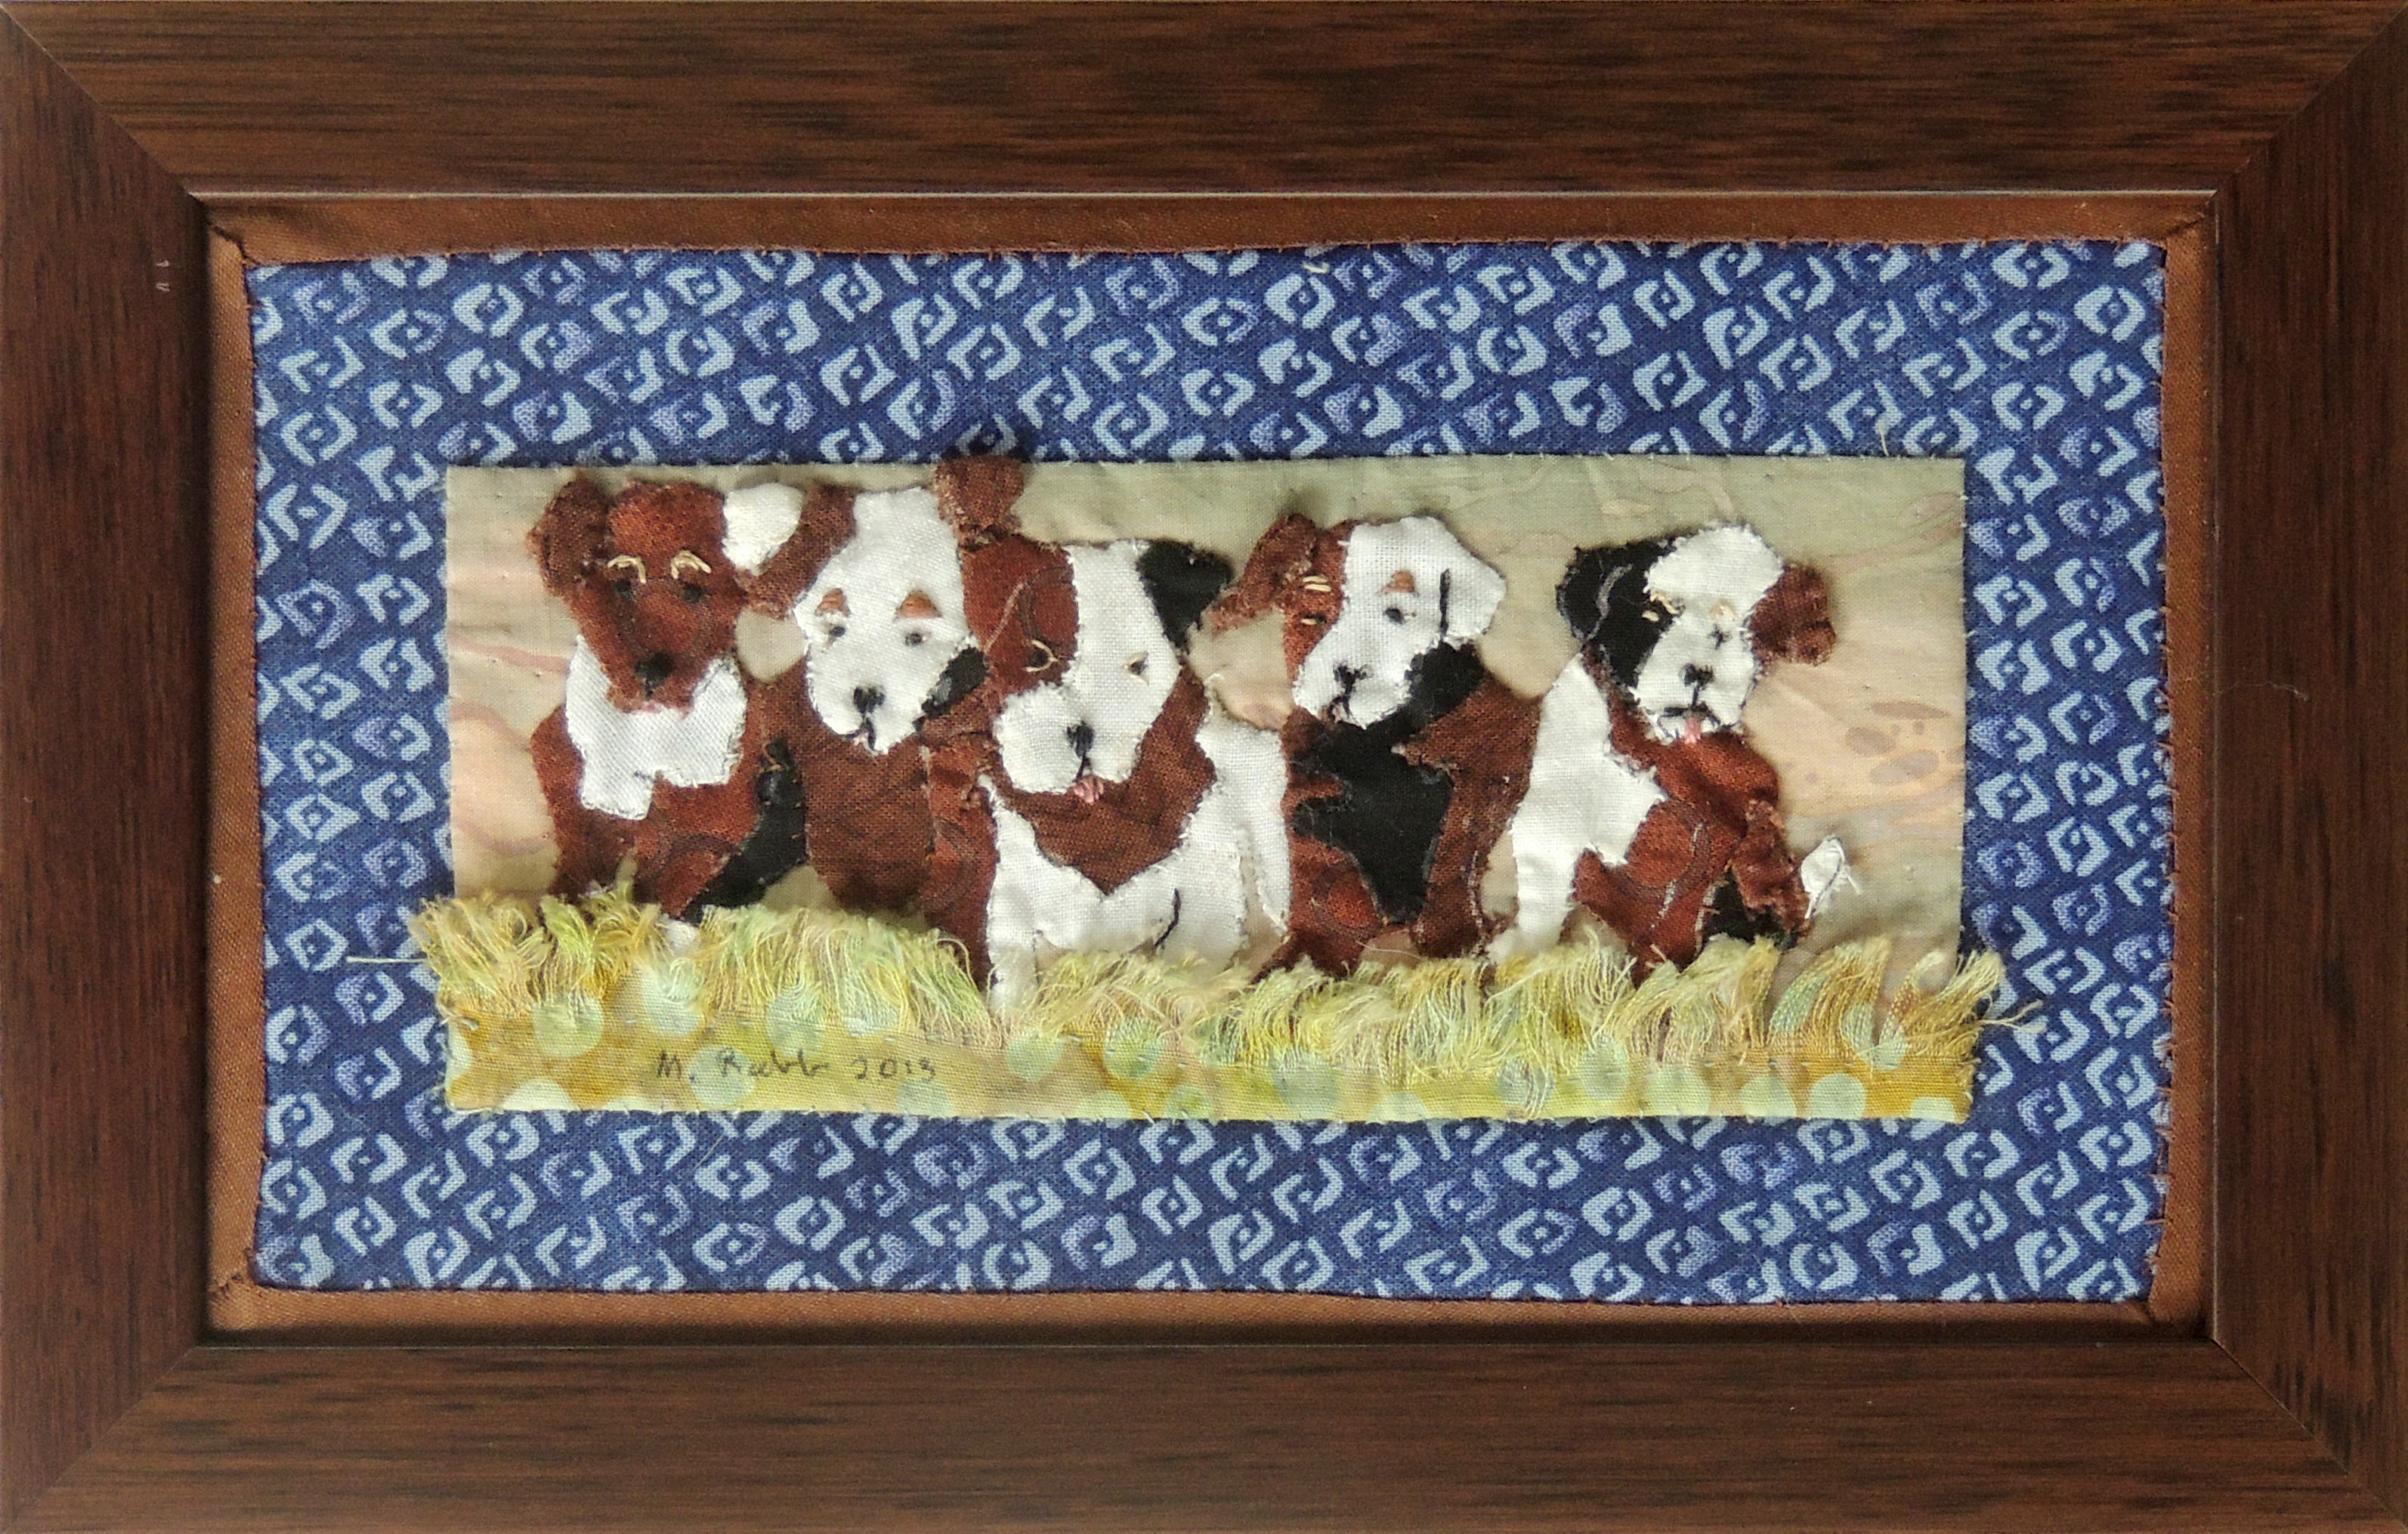 "Marianne Rabb Britton | JACK PUPPIES | Fabric & Embroidery | 6 x 9"" | Estate of Marianne Rabb Britton"